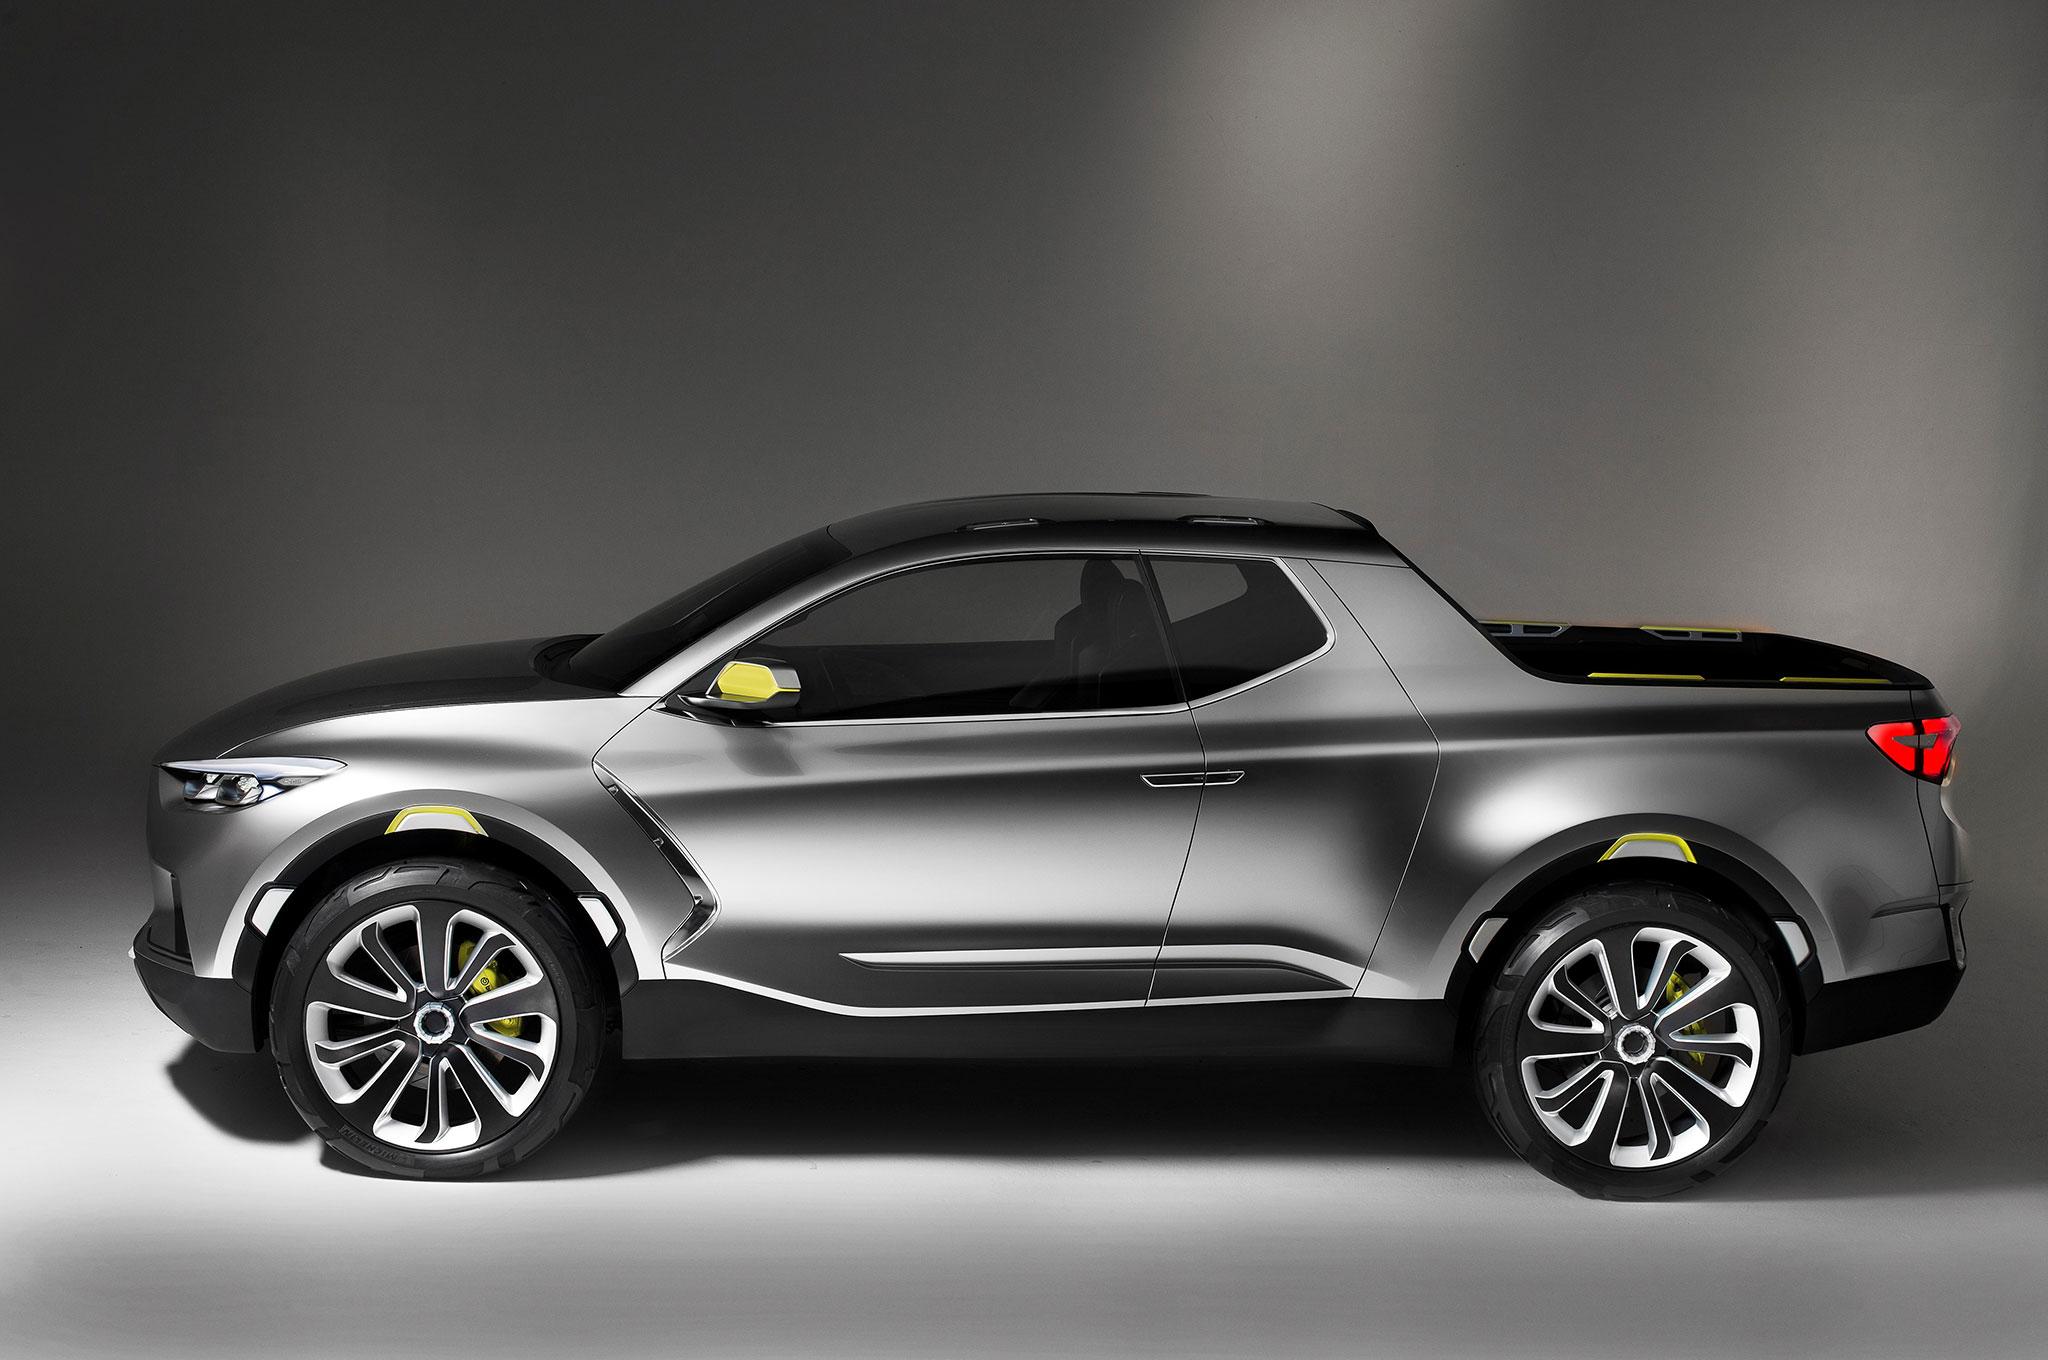 Hyundai Santa Cruz Crossover Truck Concept Profile